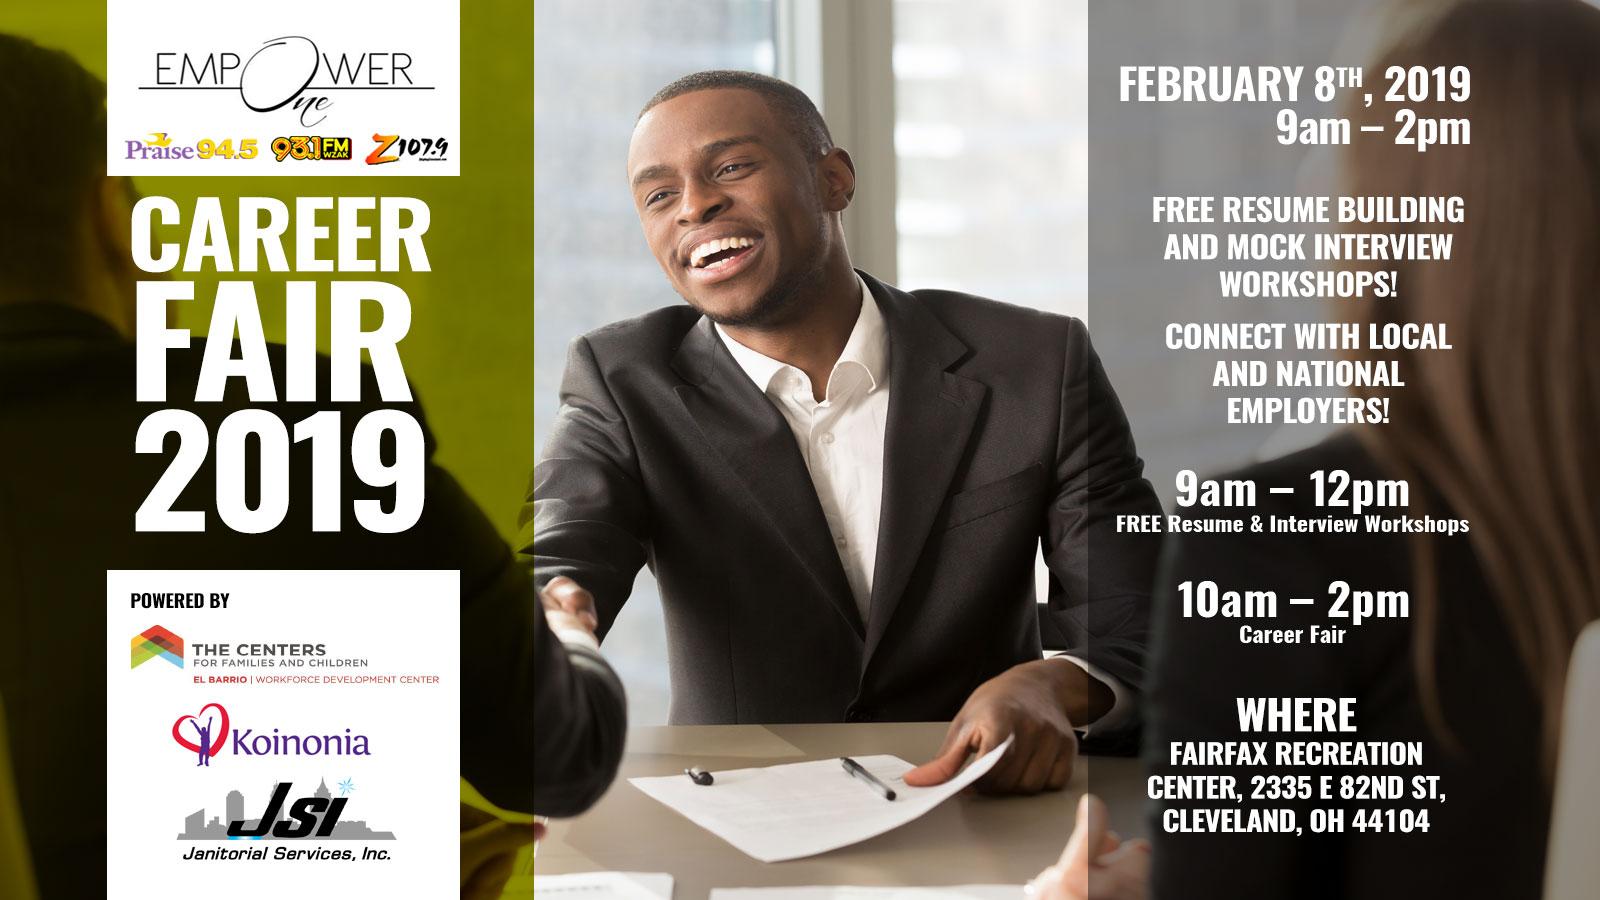 empower one job fair